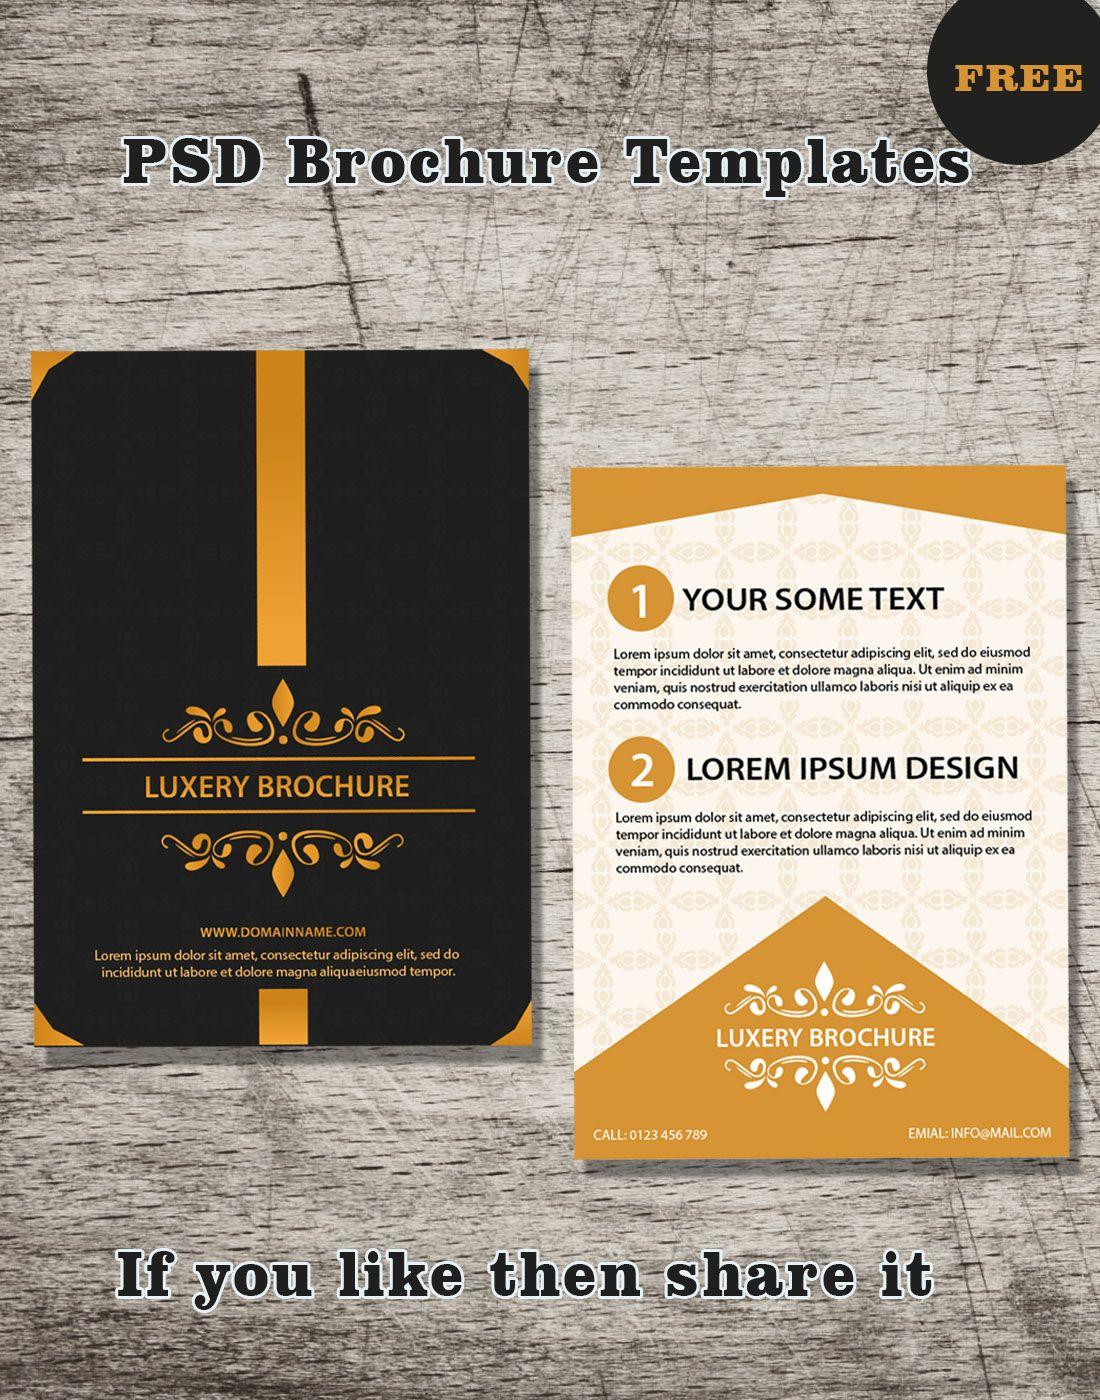 Free brochure psd templates brochure design pinterest free free brochure psd templates xflitez Images